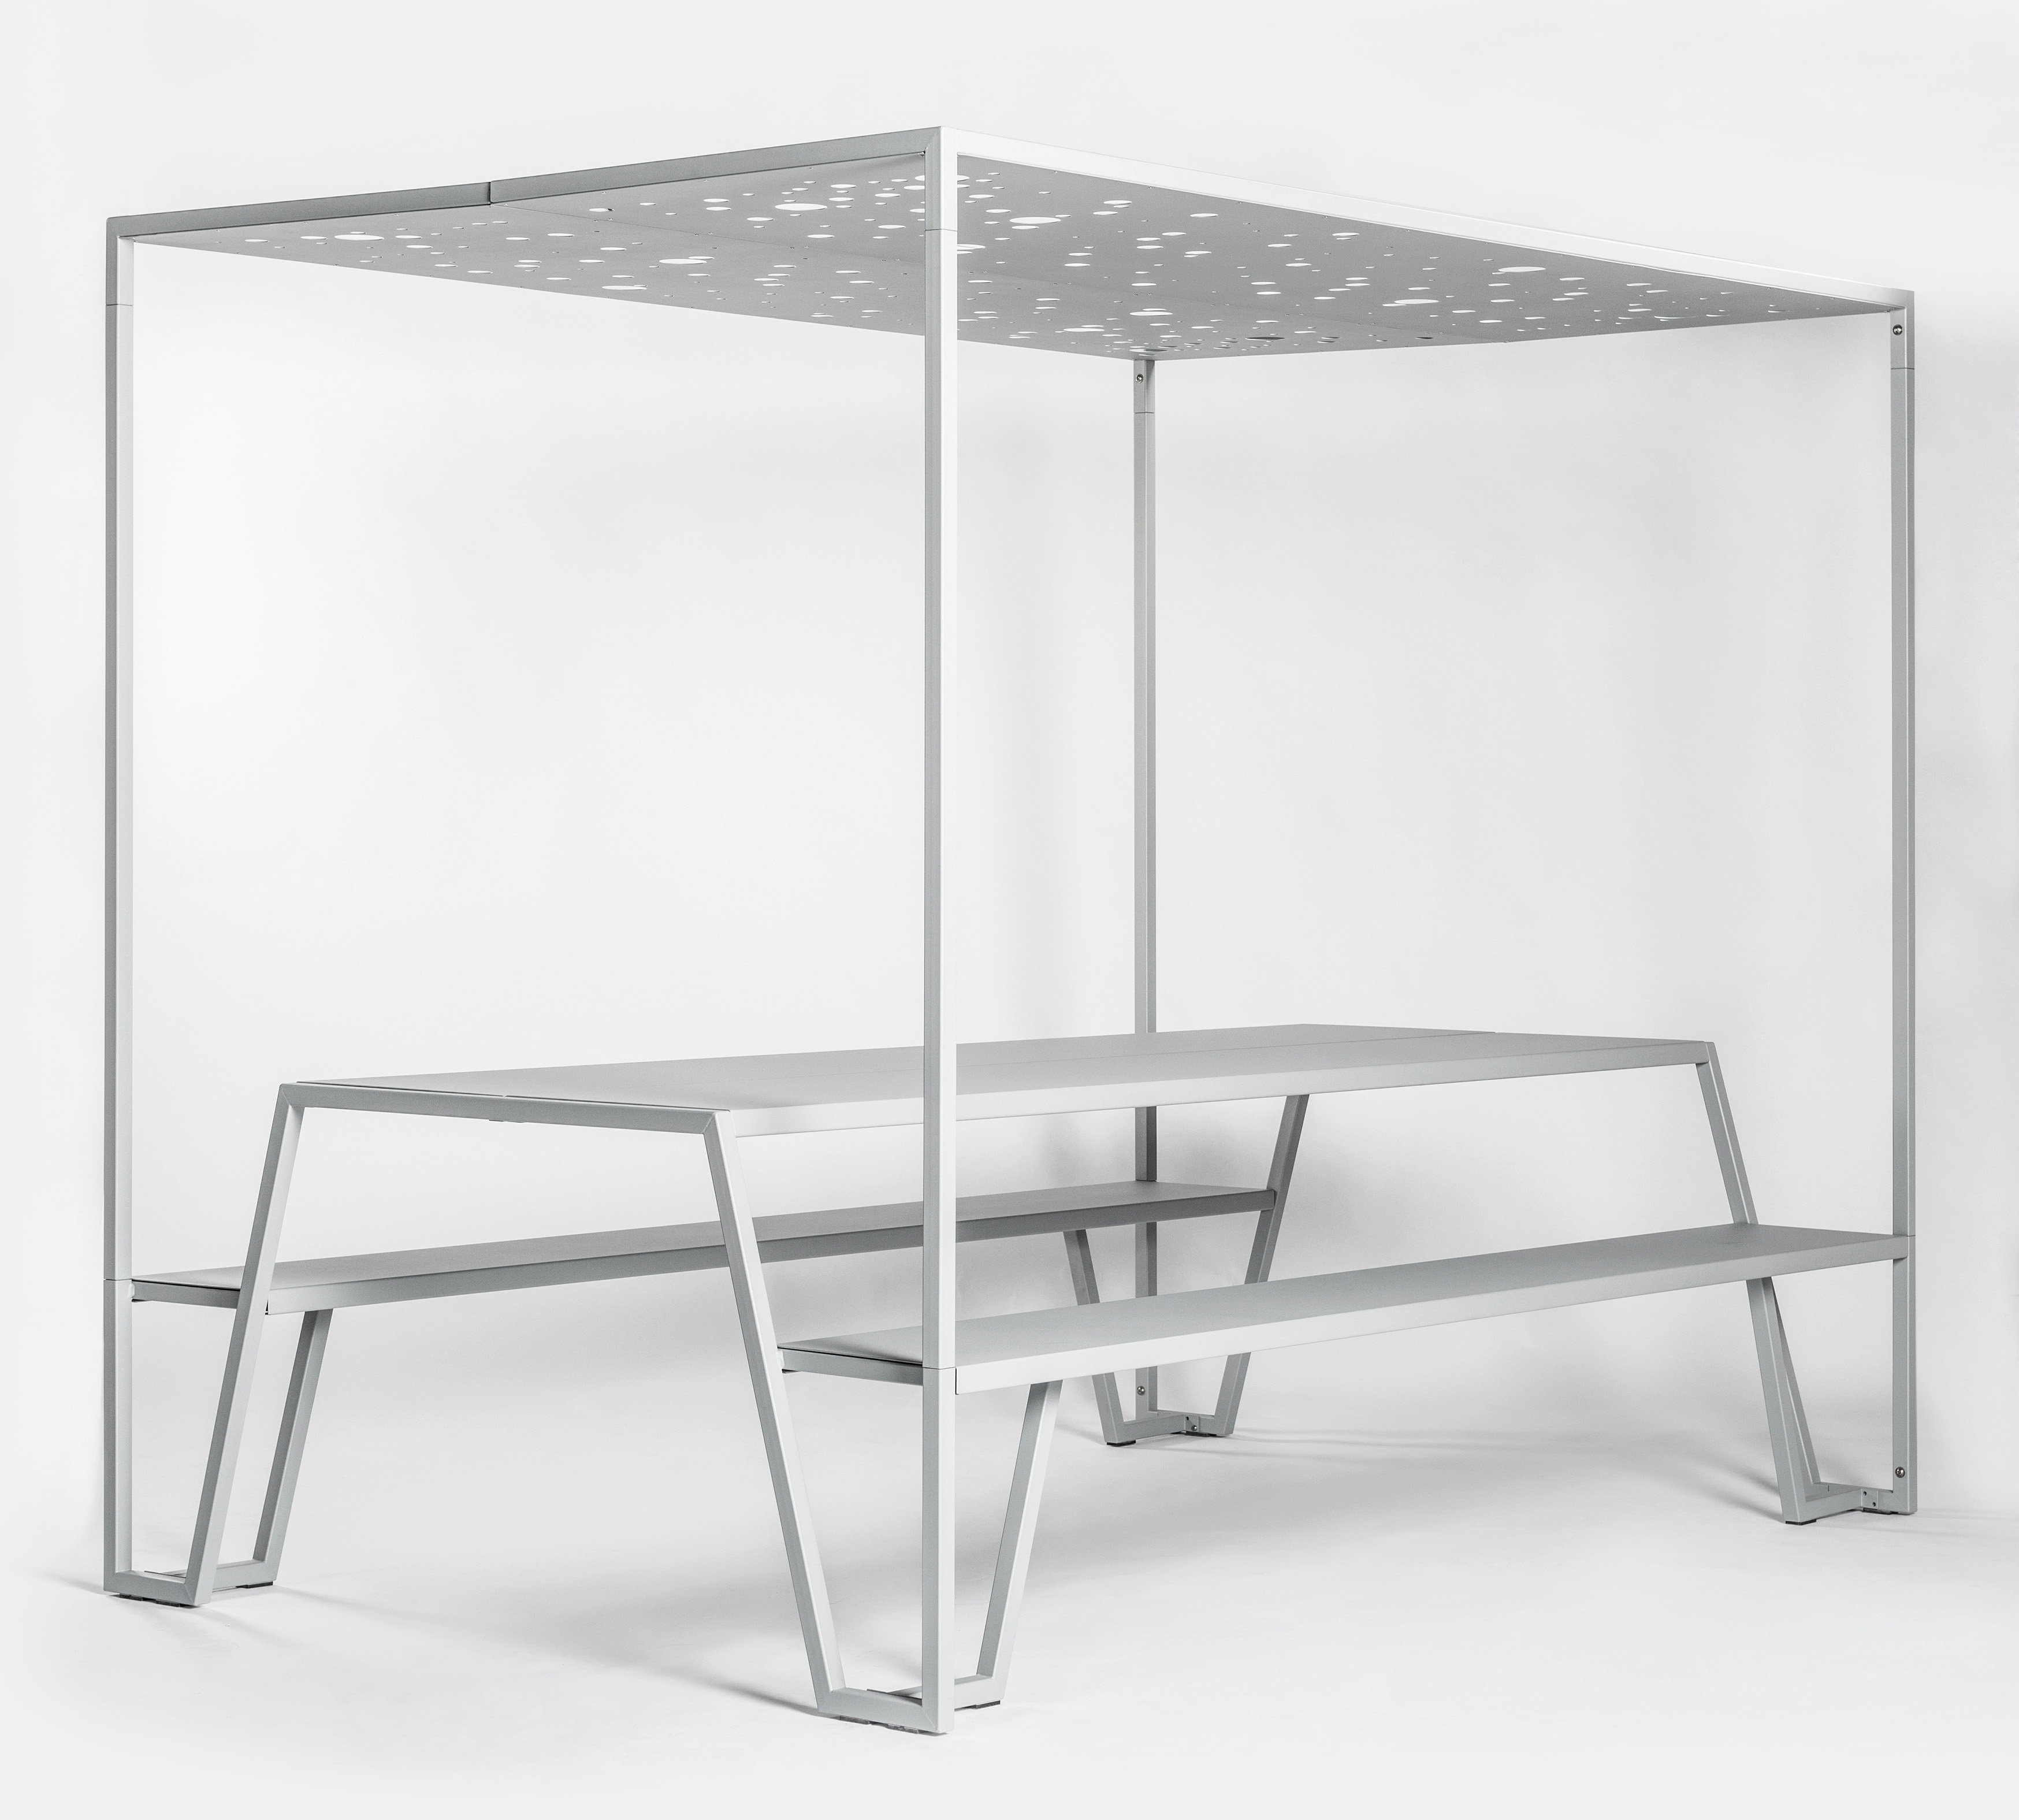 picnic-in-the-shadow-picnic-table-steel-aluminium-dsy-0048b-hero-crop